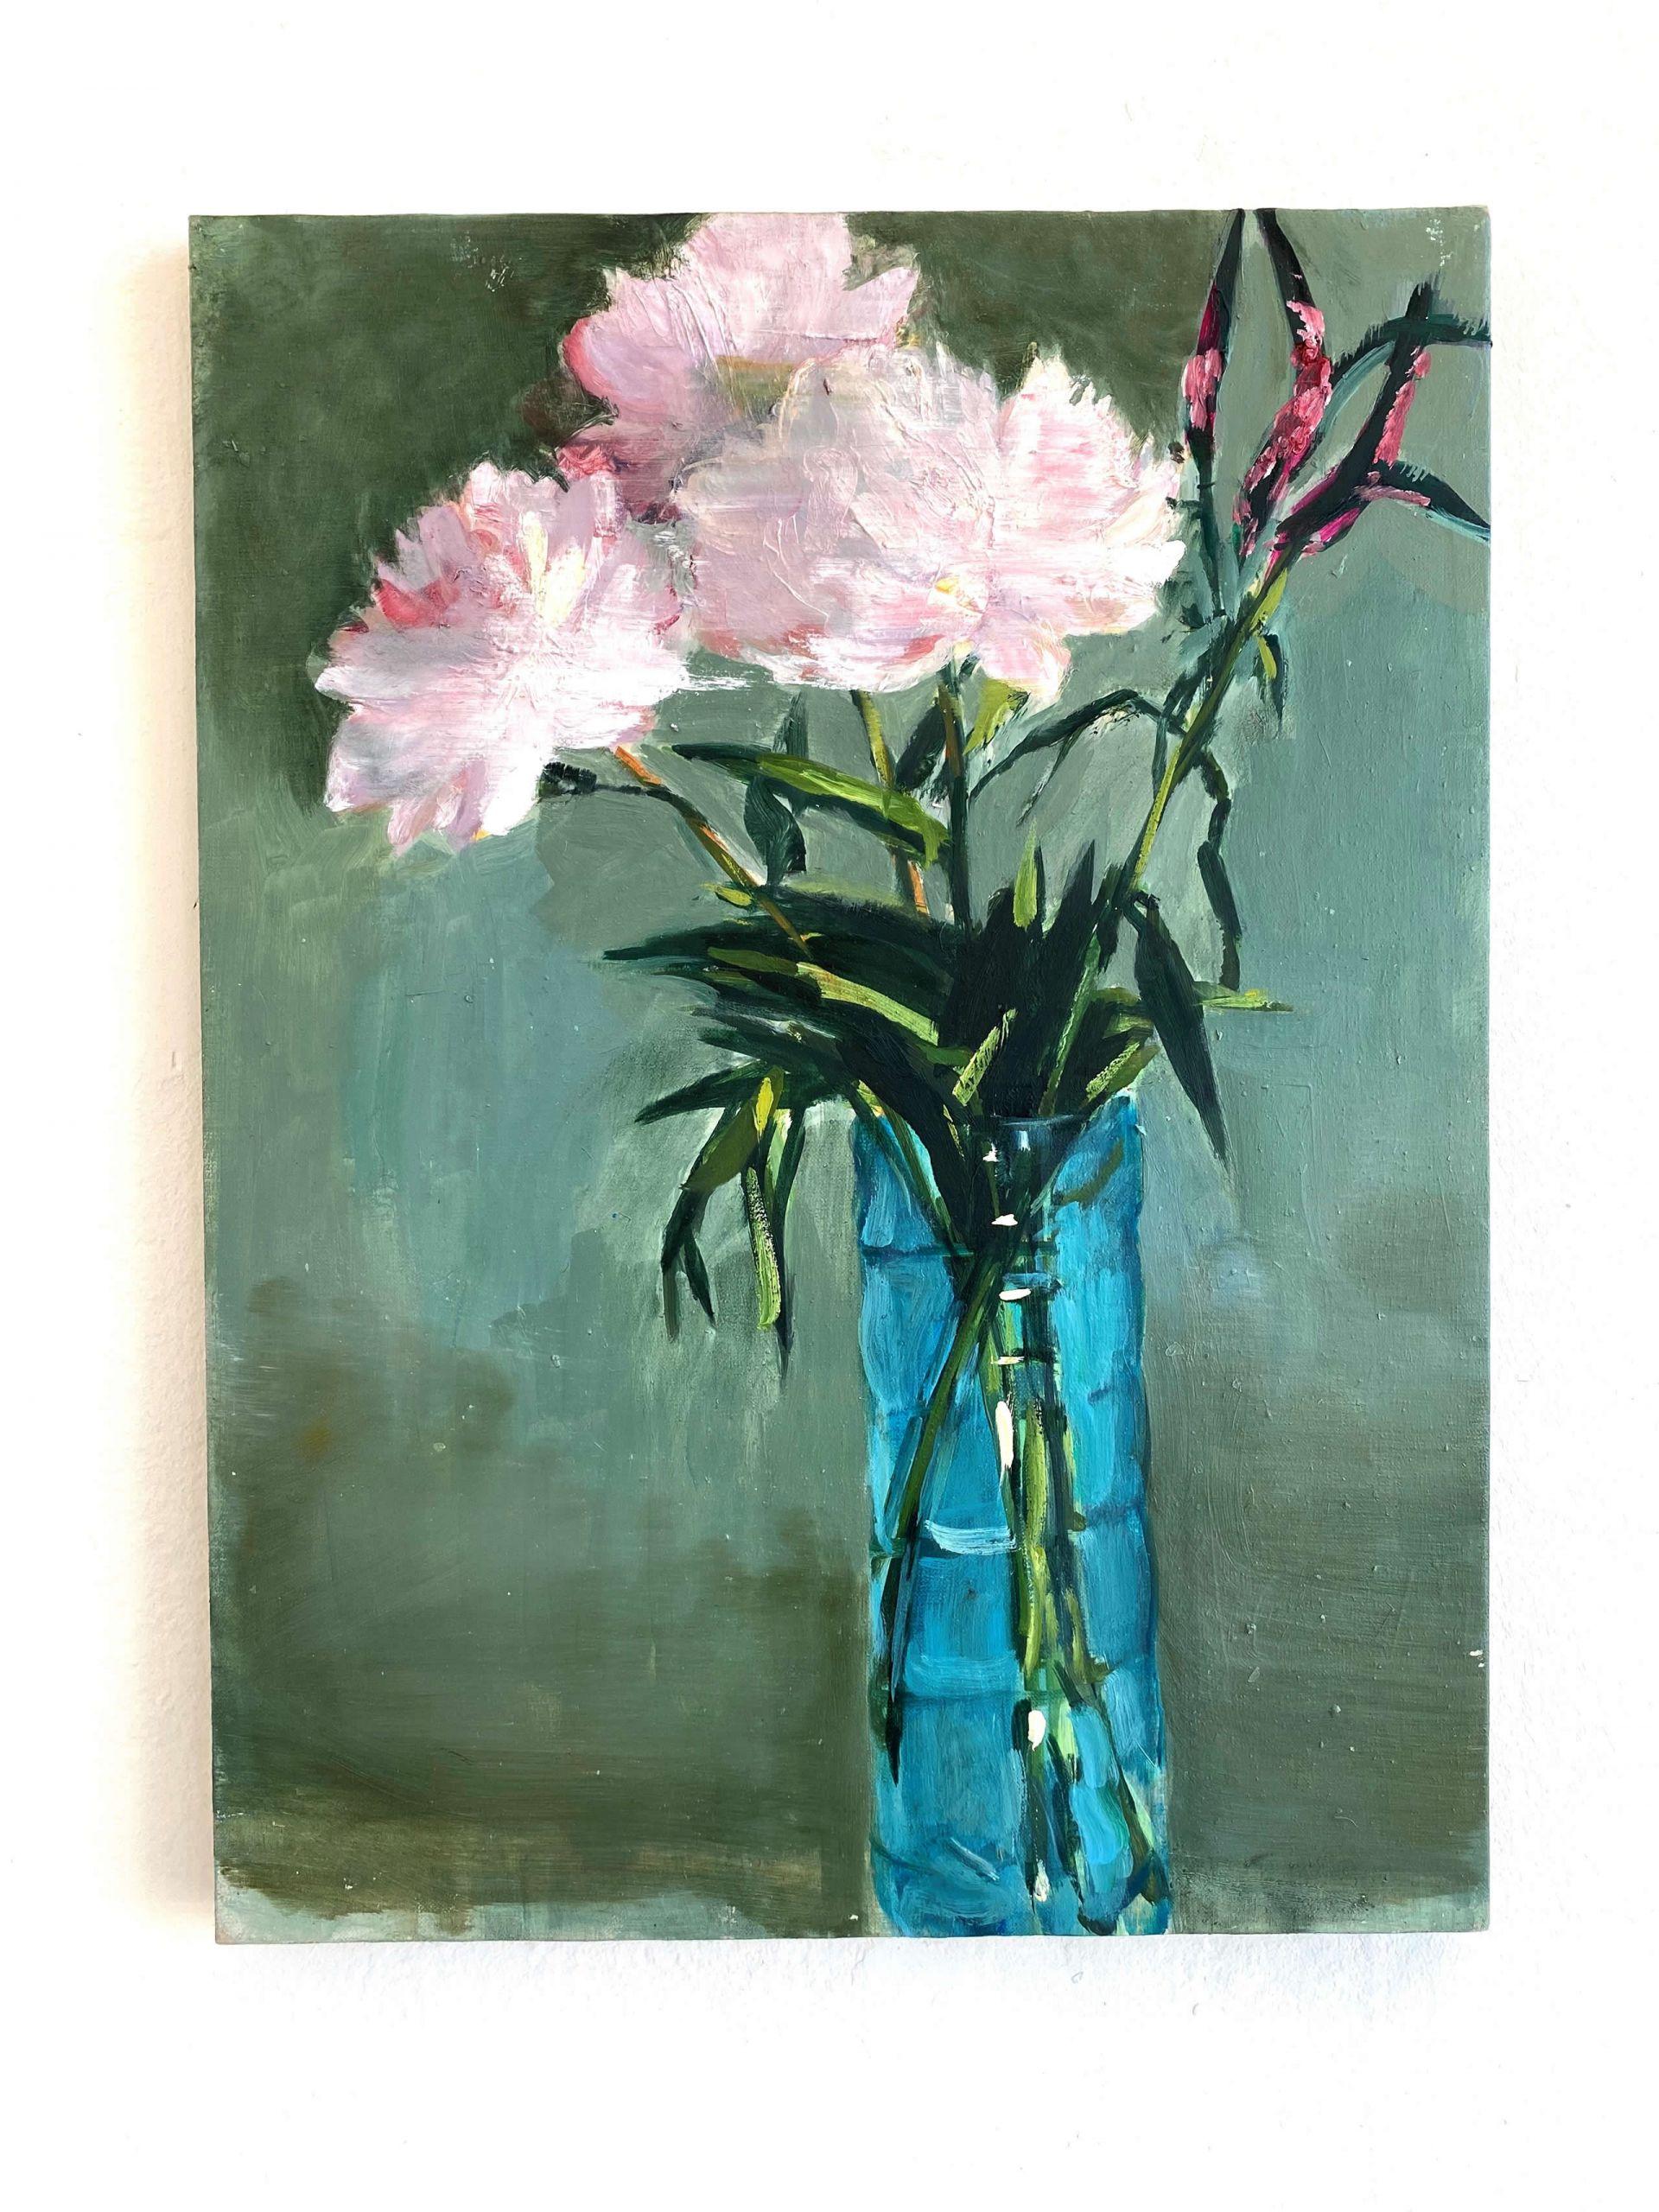 Alex Amann | 2019 | Öl auf Leinwand | 54x40cm | plaisirs simples | Galerie3